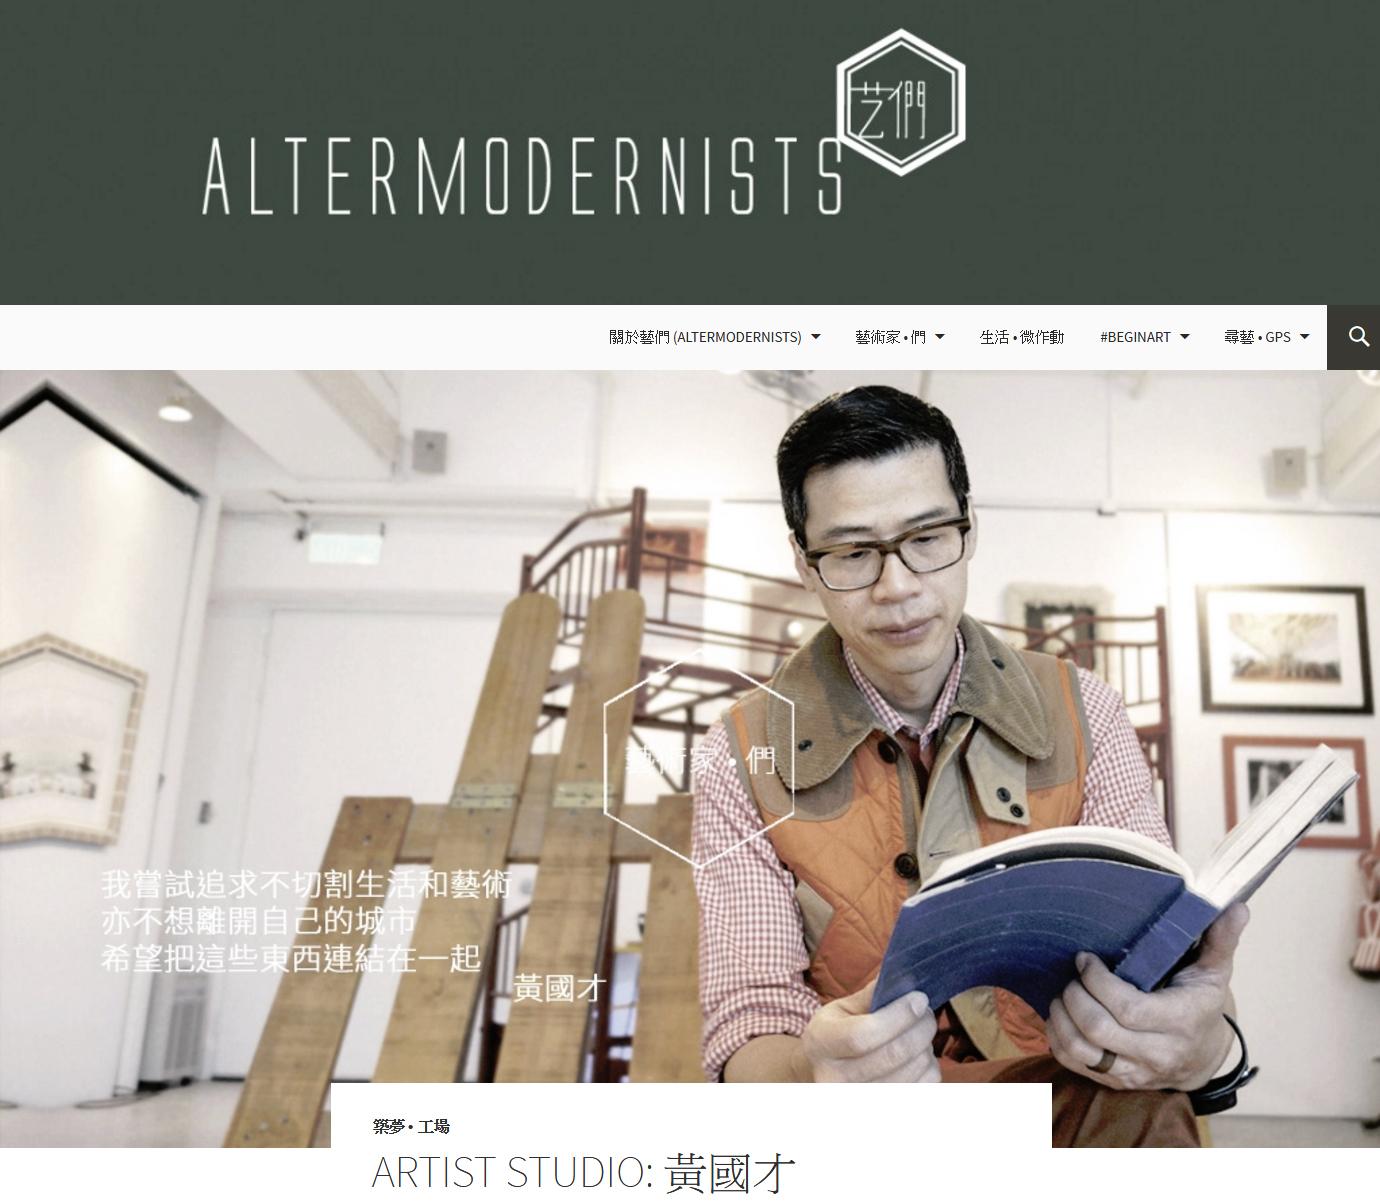 Altermodernist Interview, May 2015